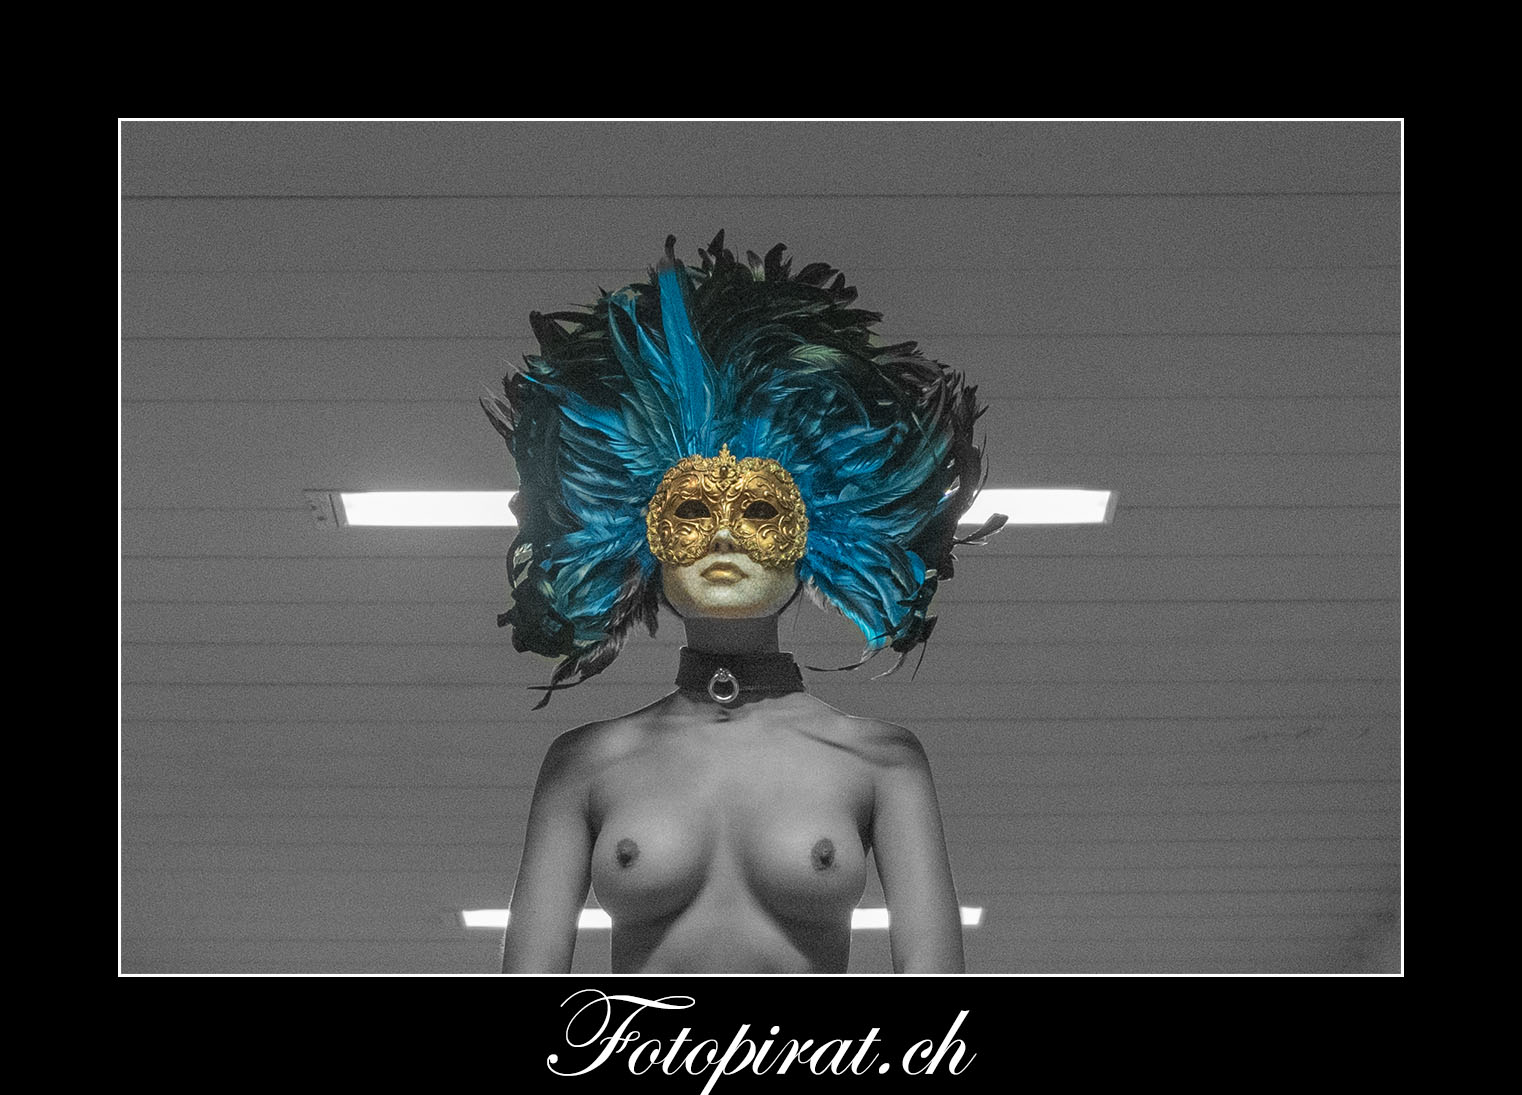 Eyes Wild Shut; Tom Cruise; Venezianische Maske; Nude; Bondage; SW; Color Key; Grosse Brüste; Halsband; Federmaske; Fotoshooting Zürich; Spezial Fotoshooting